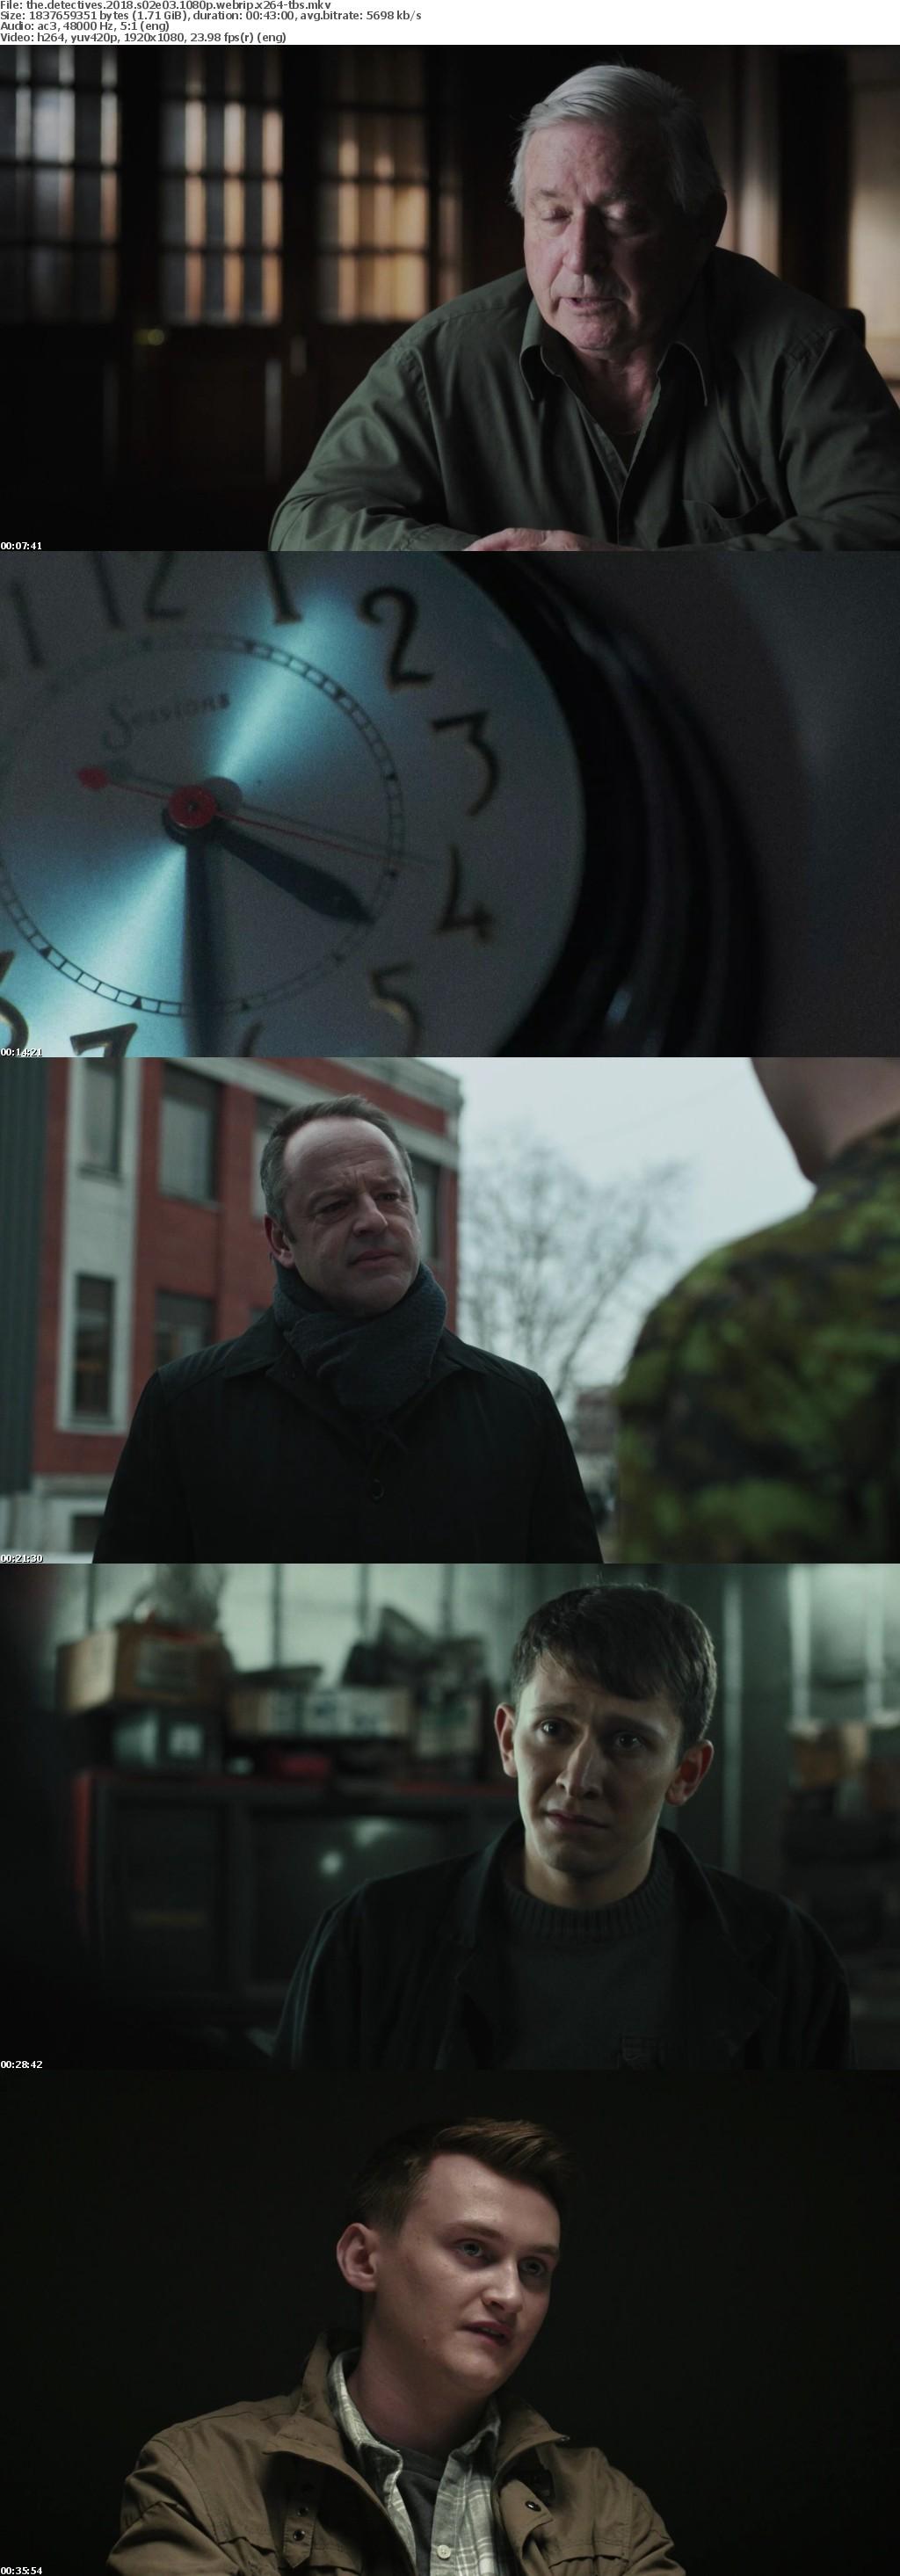 The Detectives 2018 S02E03 1080p WEBRip x264-TBS